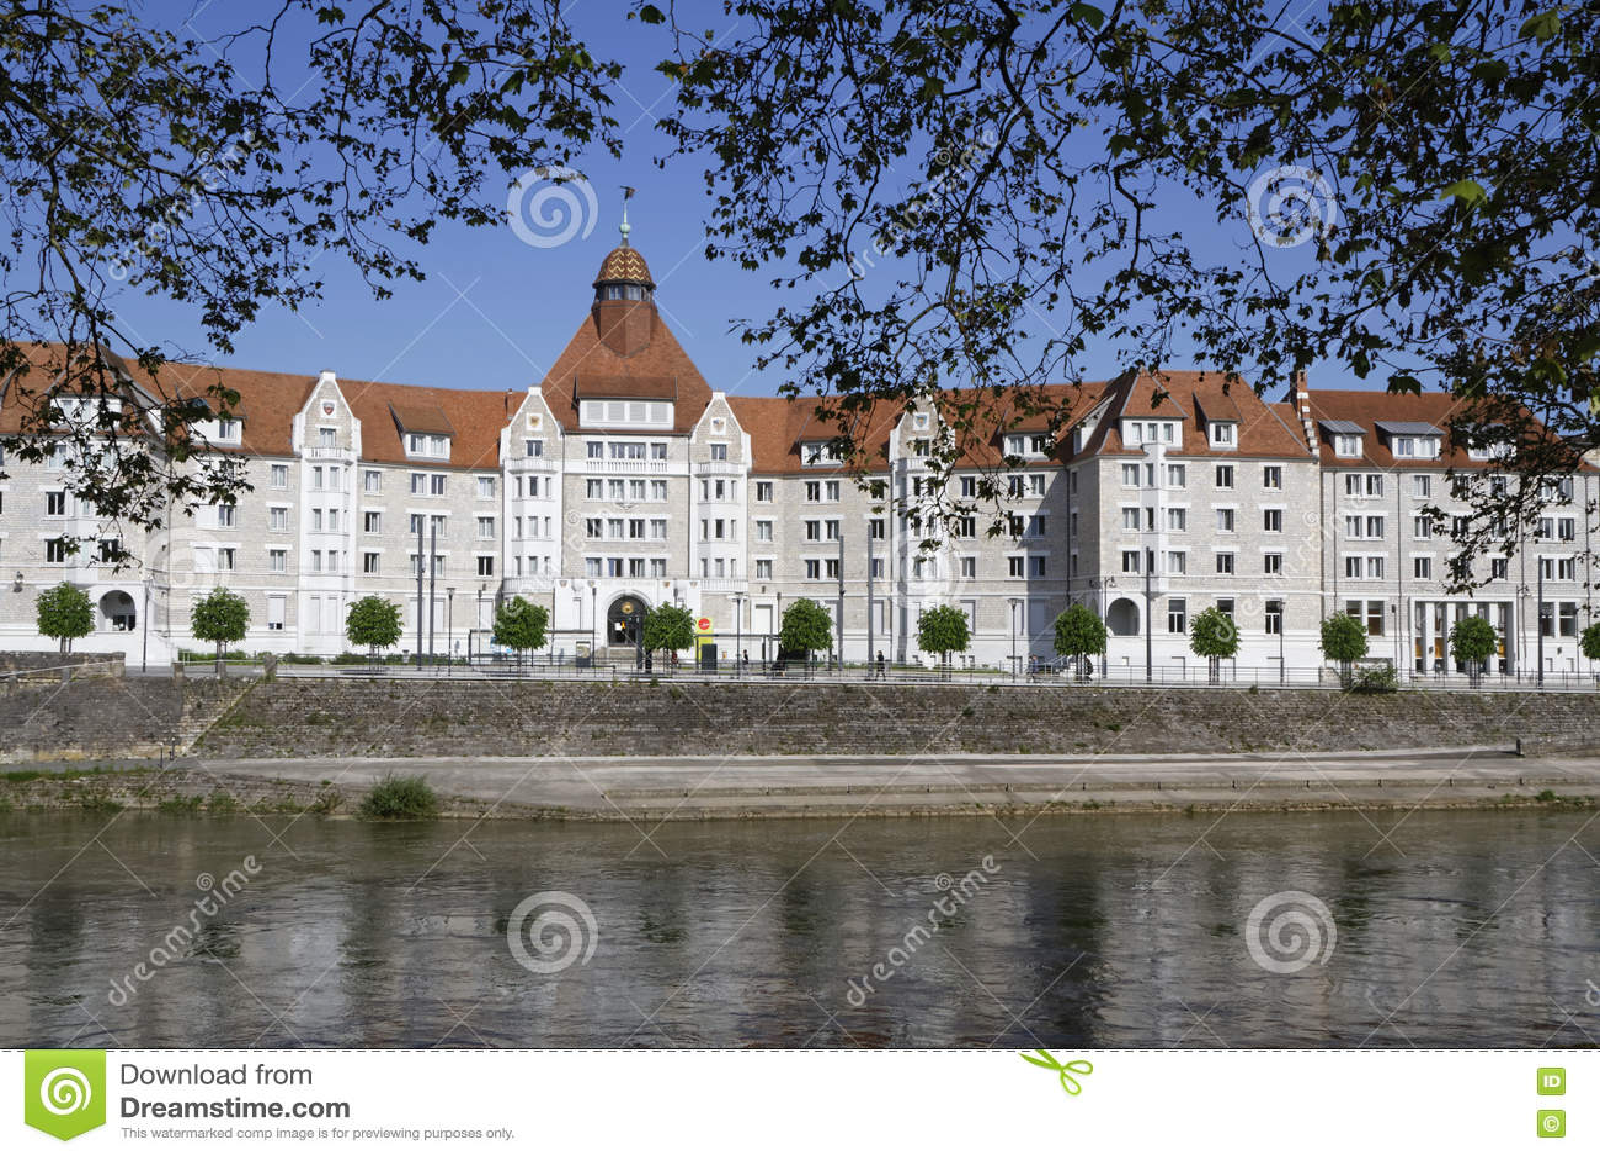 Besancon University editorial stock photo. Image of river - 71757208